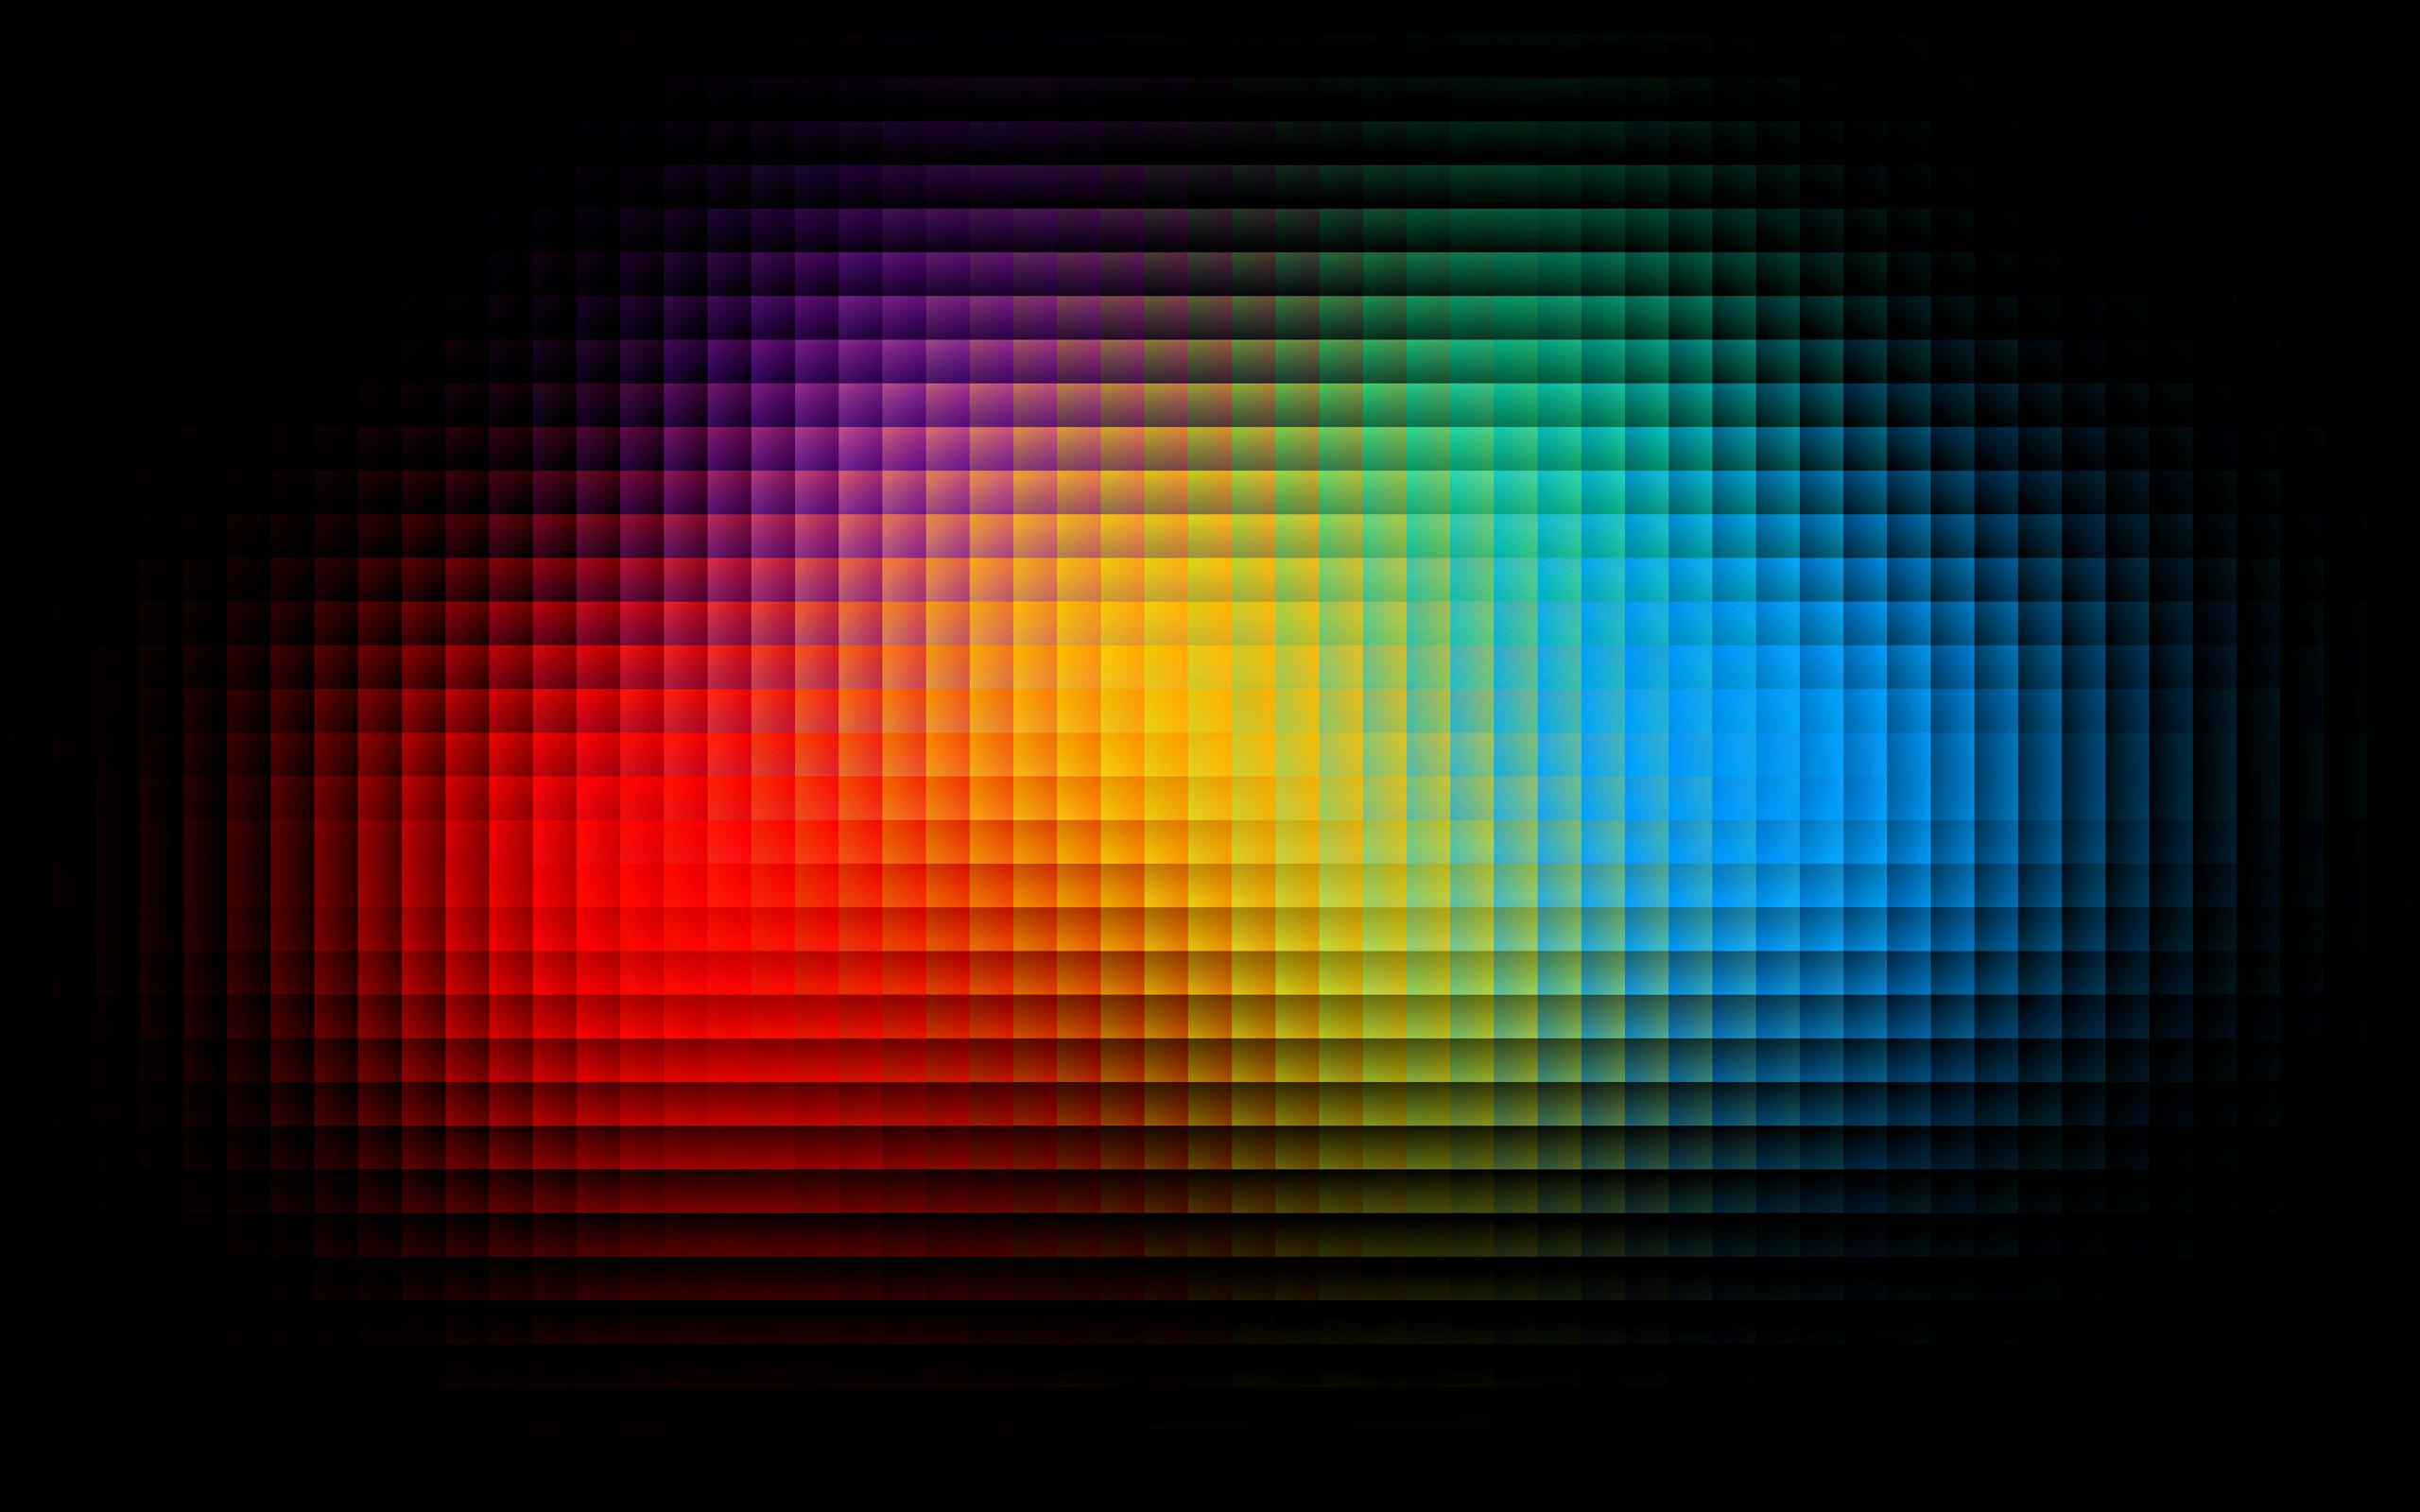 Colorful pixels wallpaper 2560x1600 1952 WallpaperUP 2560x1600